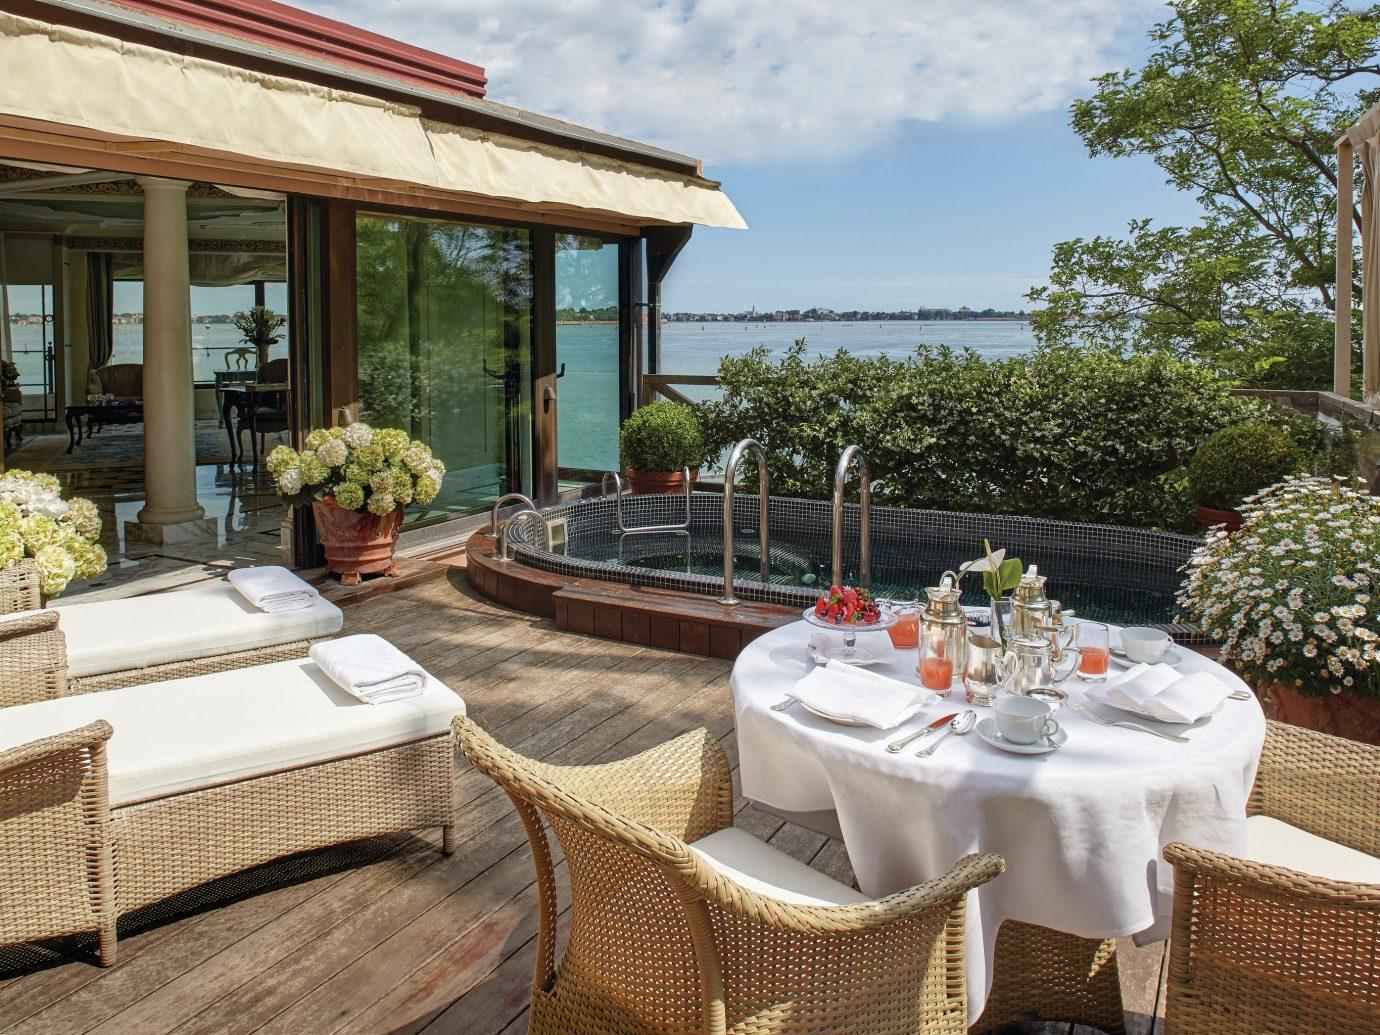 Hotels Italy Luxury Travel Venice table outdoor property building Resort real estate estate outdoor structure Patio backyard Villa Garden